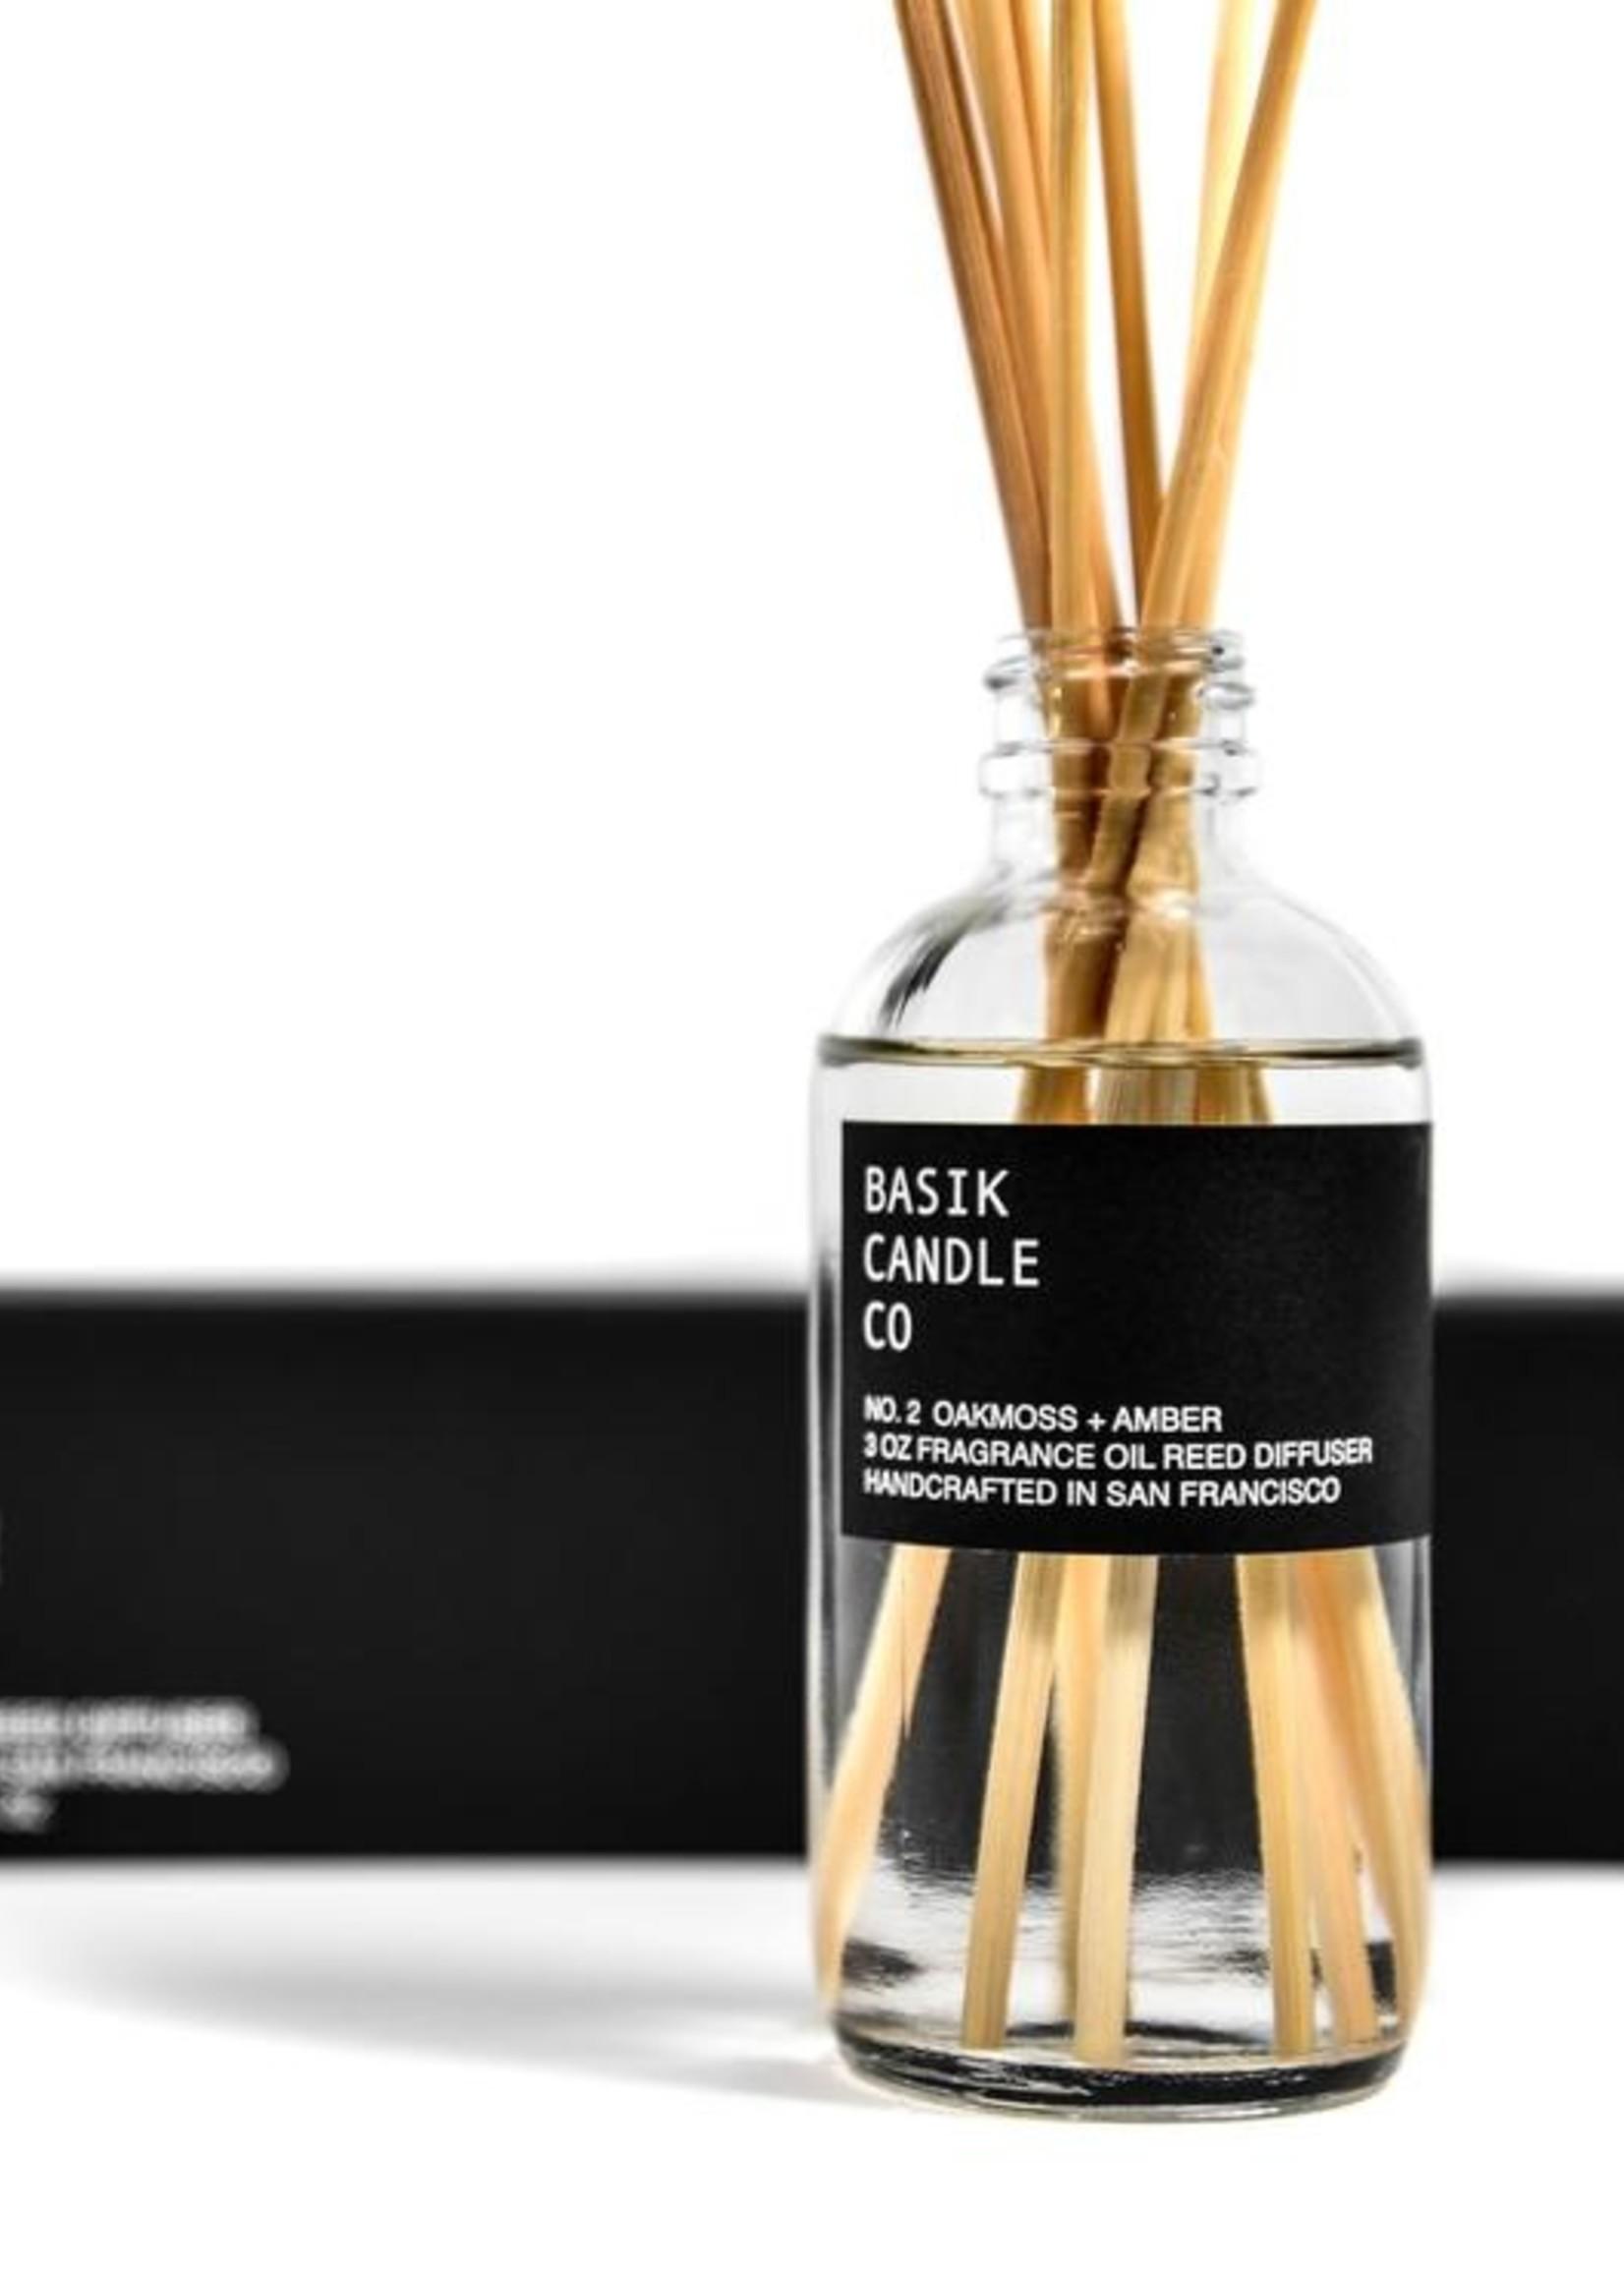 Basik Candle Co. No.2 Oakmoss & Amber Reed Diffuser